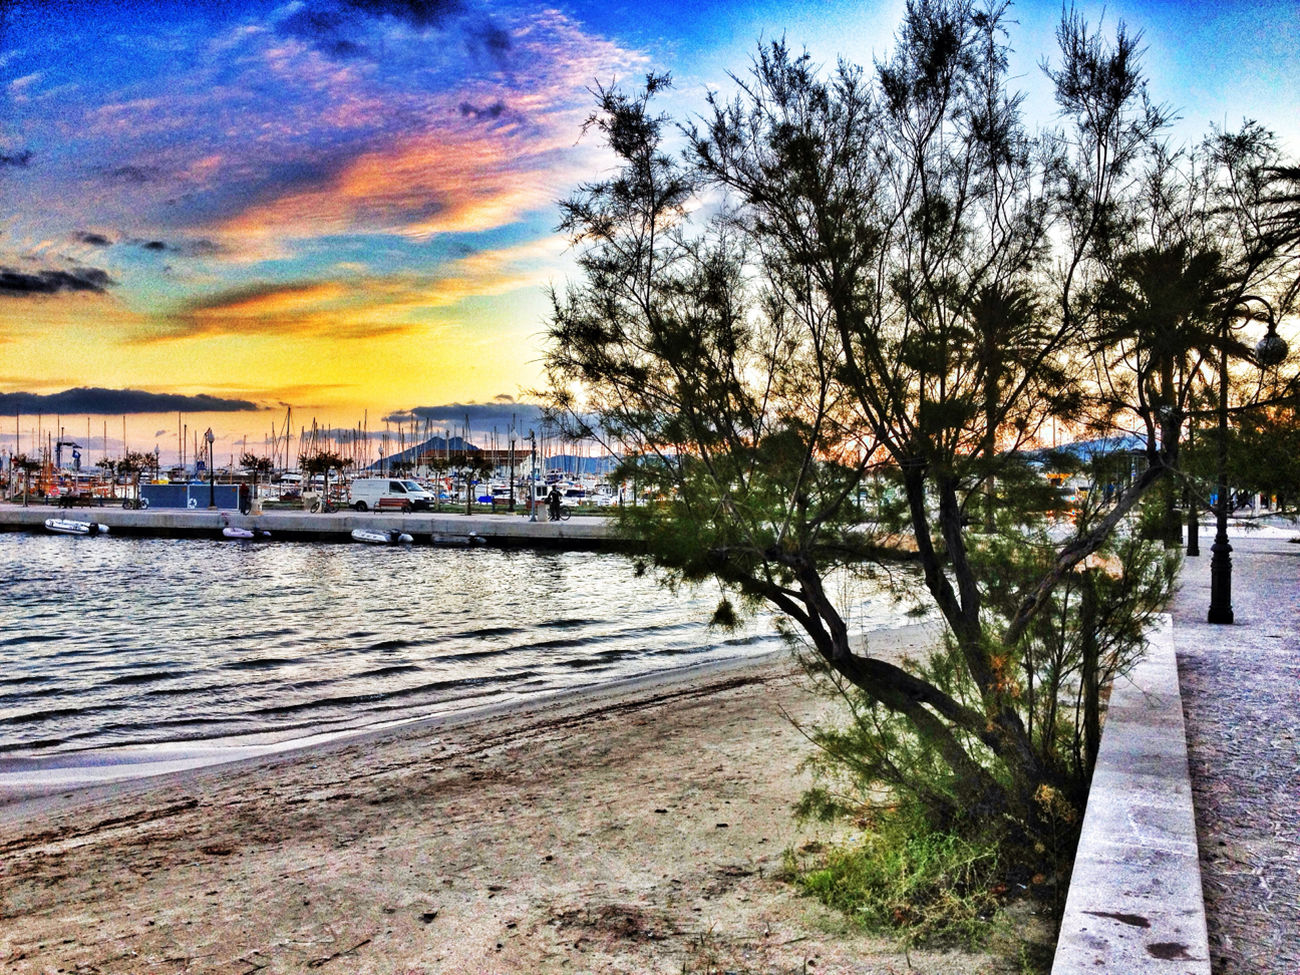 Blue Mallorca SPAIN On The Road